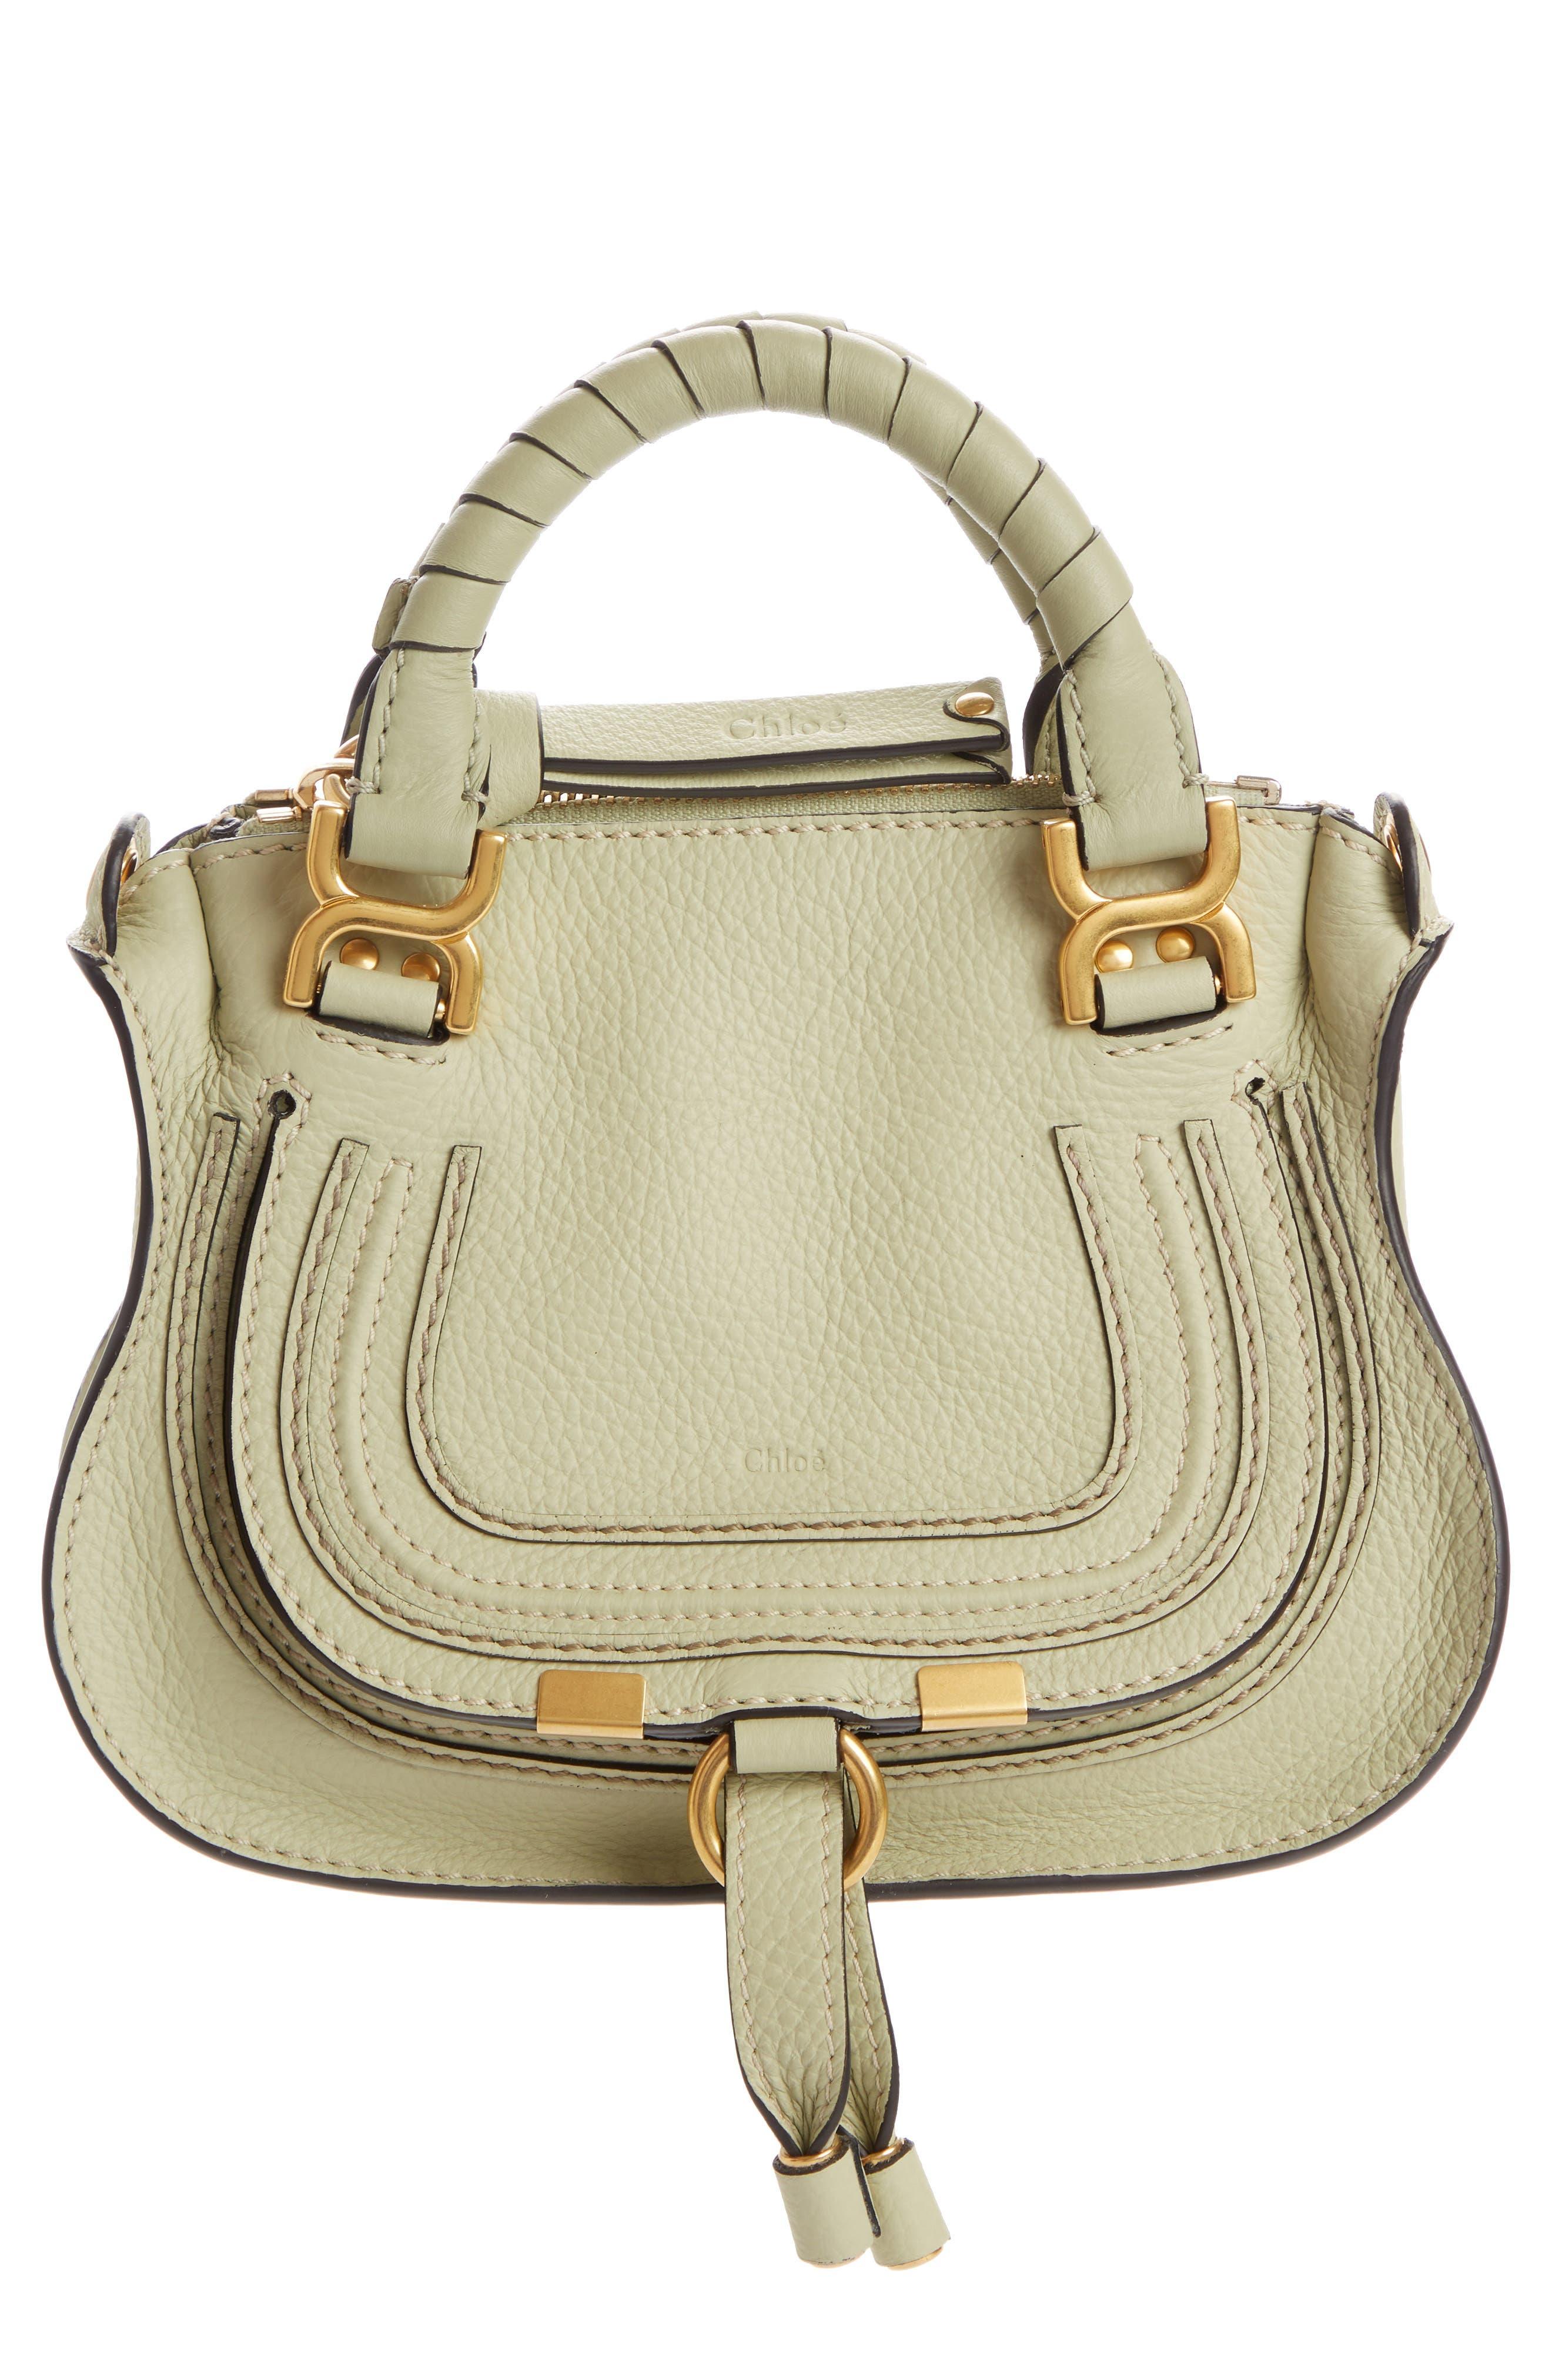 Chloé Mini Marcie Leather Crossbody Bag | Nordstrom